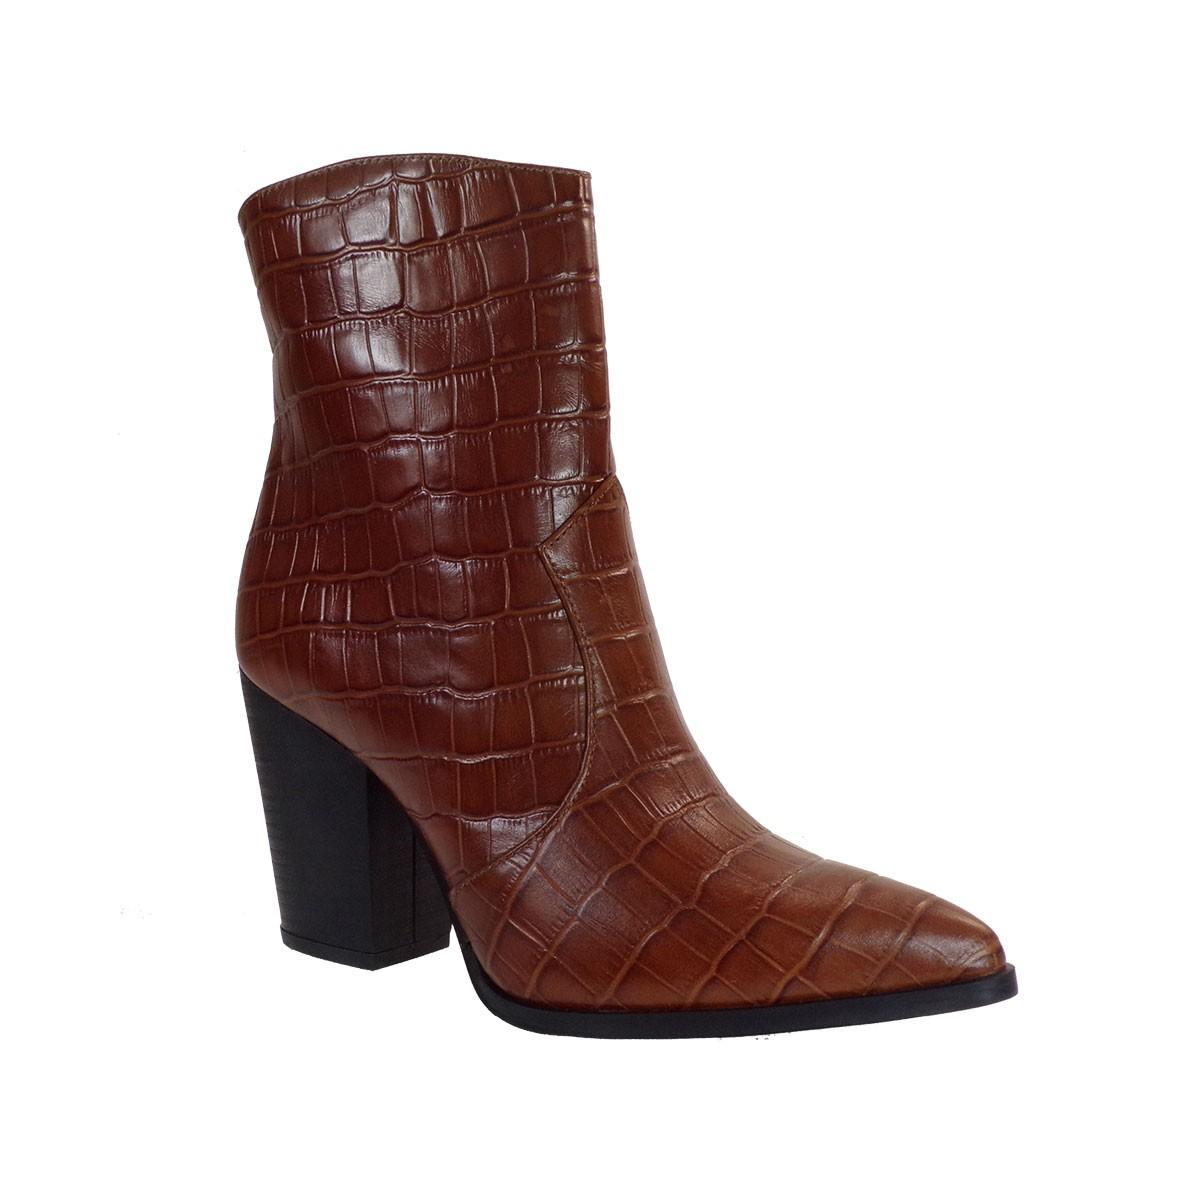 Fardoulis Shoes Γυναικεία Μποτάκια COW BOY Κ-316 Ταμπά Δέρμα Κορκό